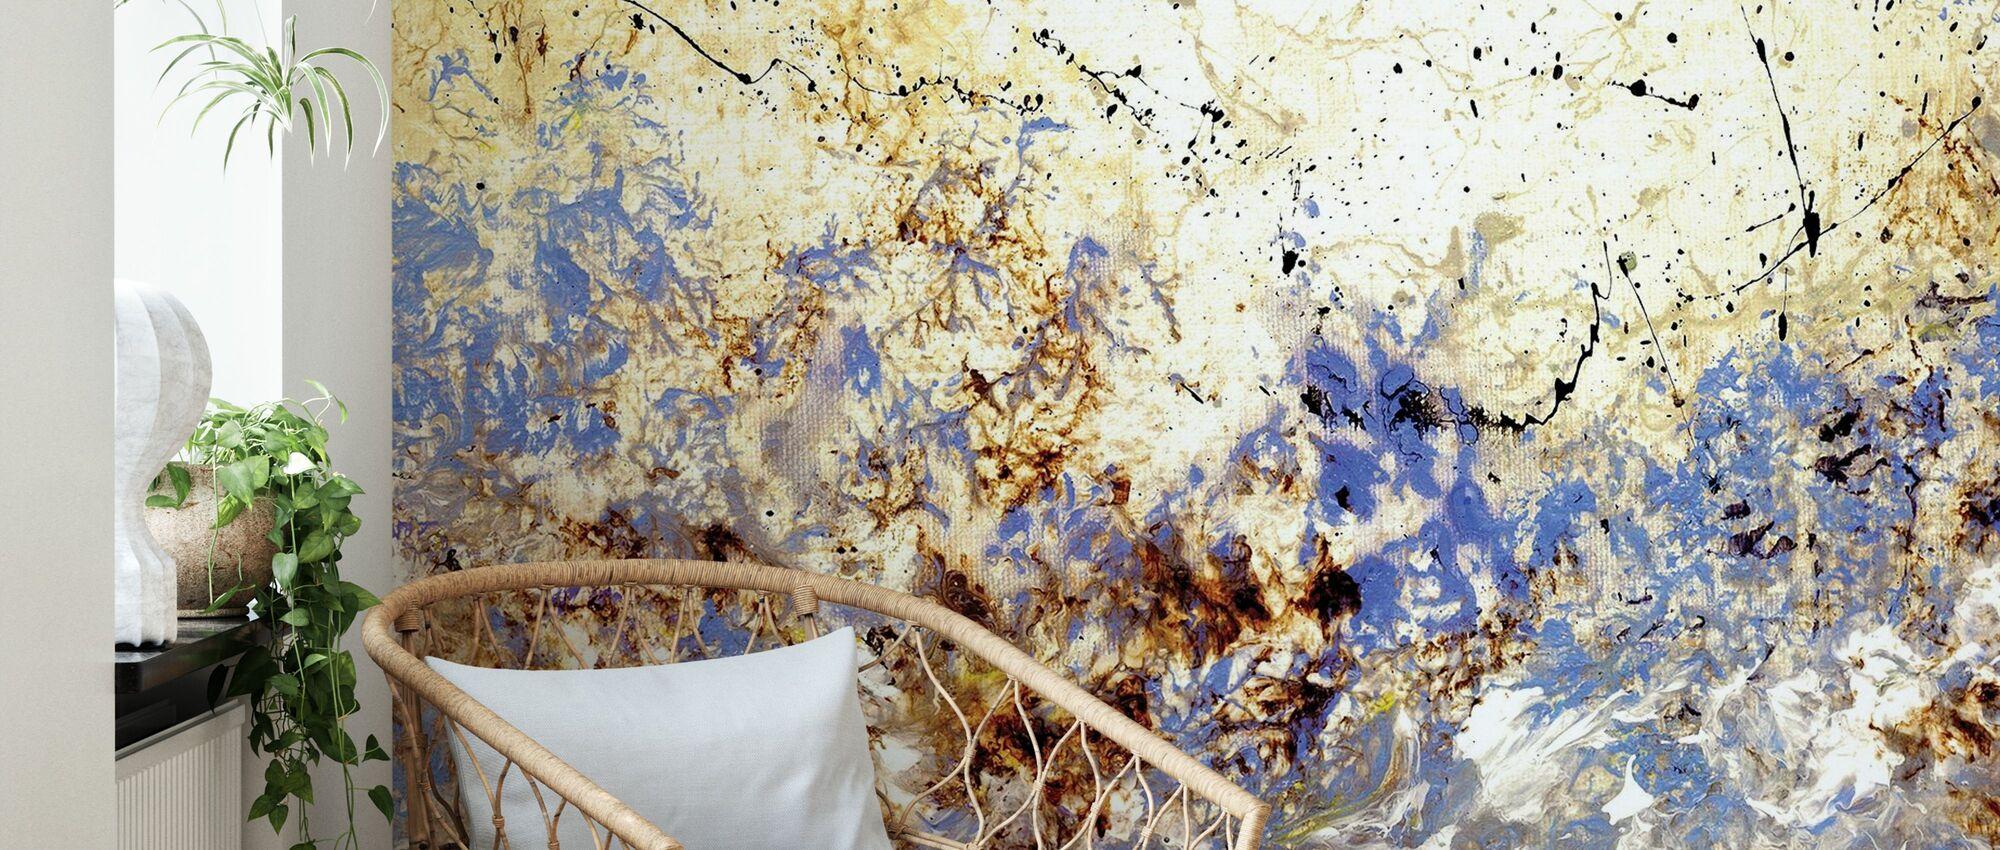 Inspirit - Wallpaper - Living Room